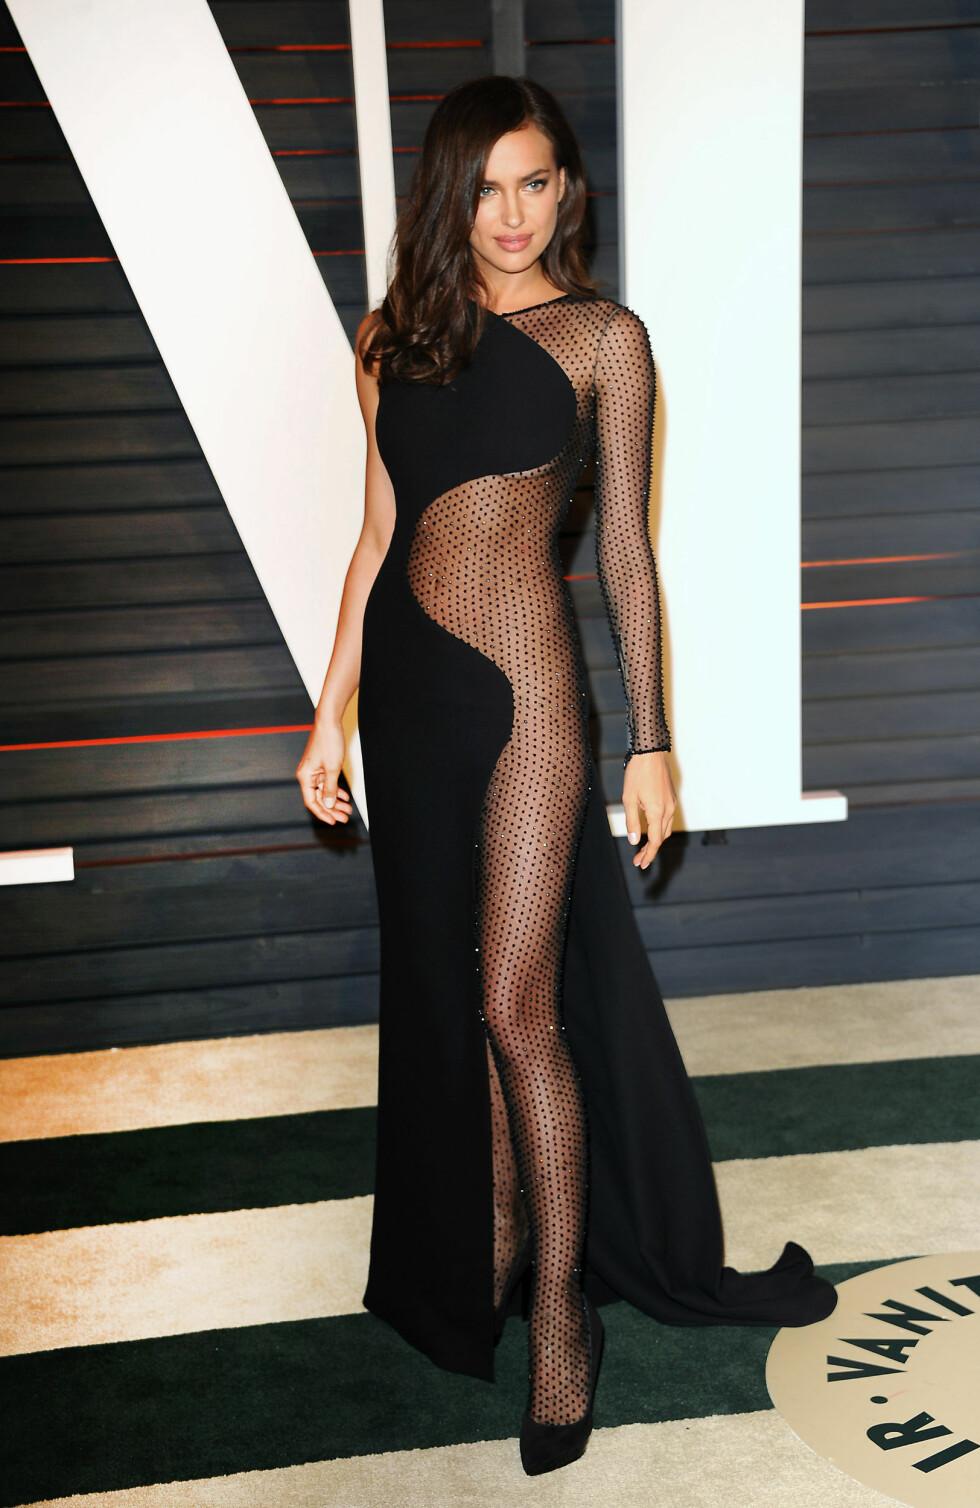 LANGE BEN: Supermodell Irina Shayk på Vanity Fair Oscar Party i fjor. Foto: NTB Scanpix